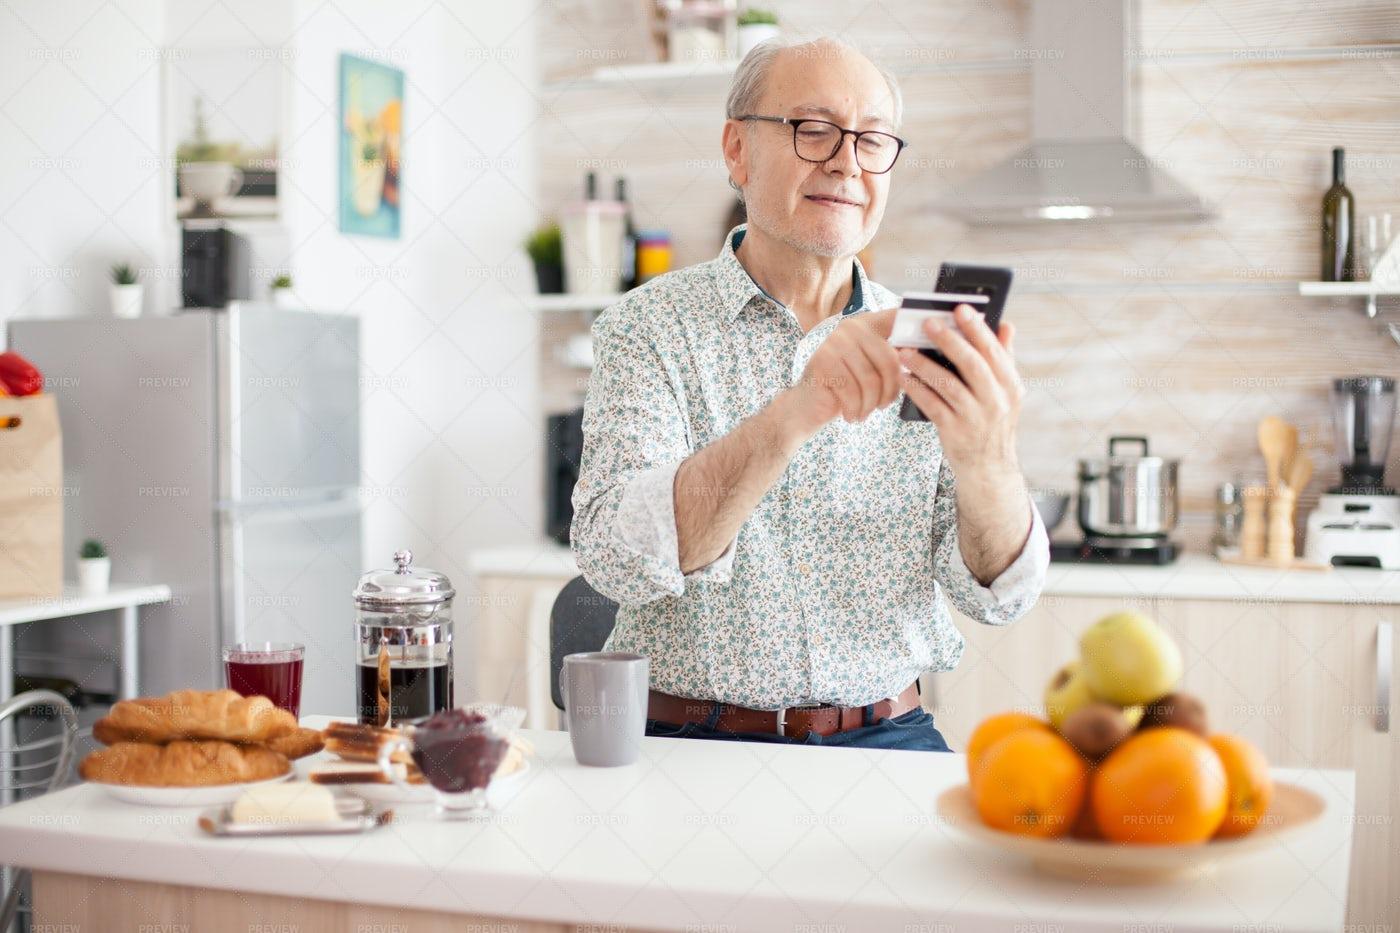 Man Doing Online Transaction: Stock Photos